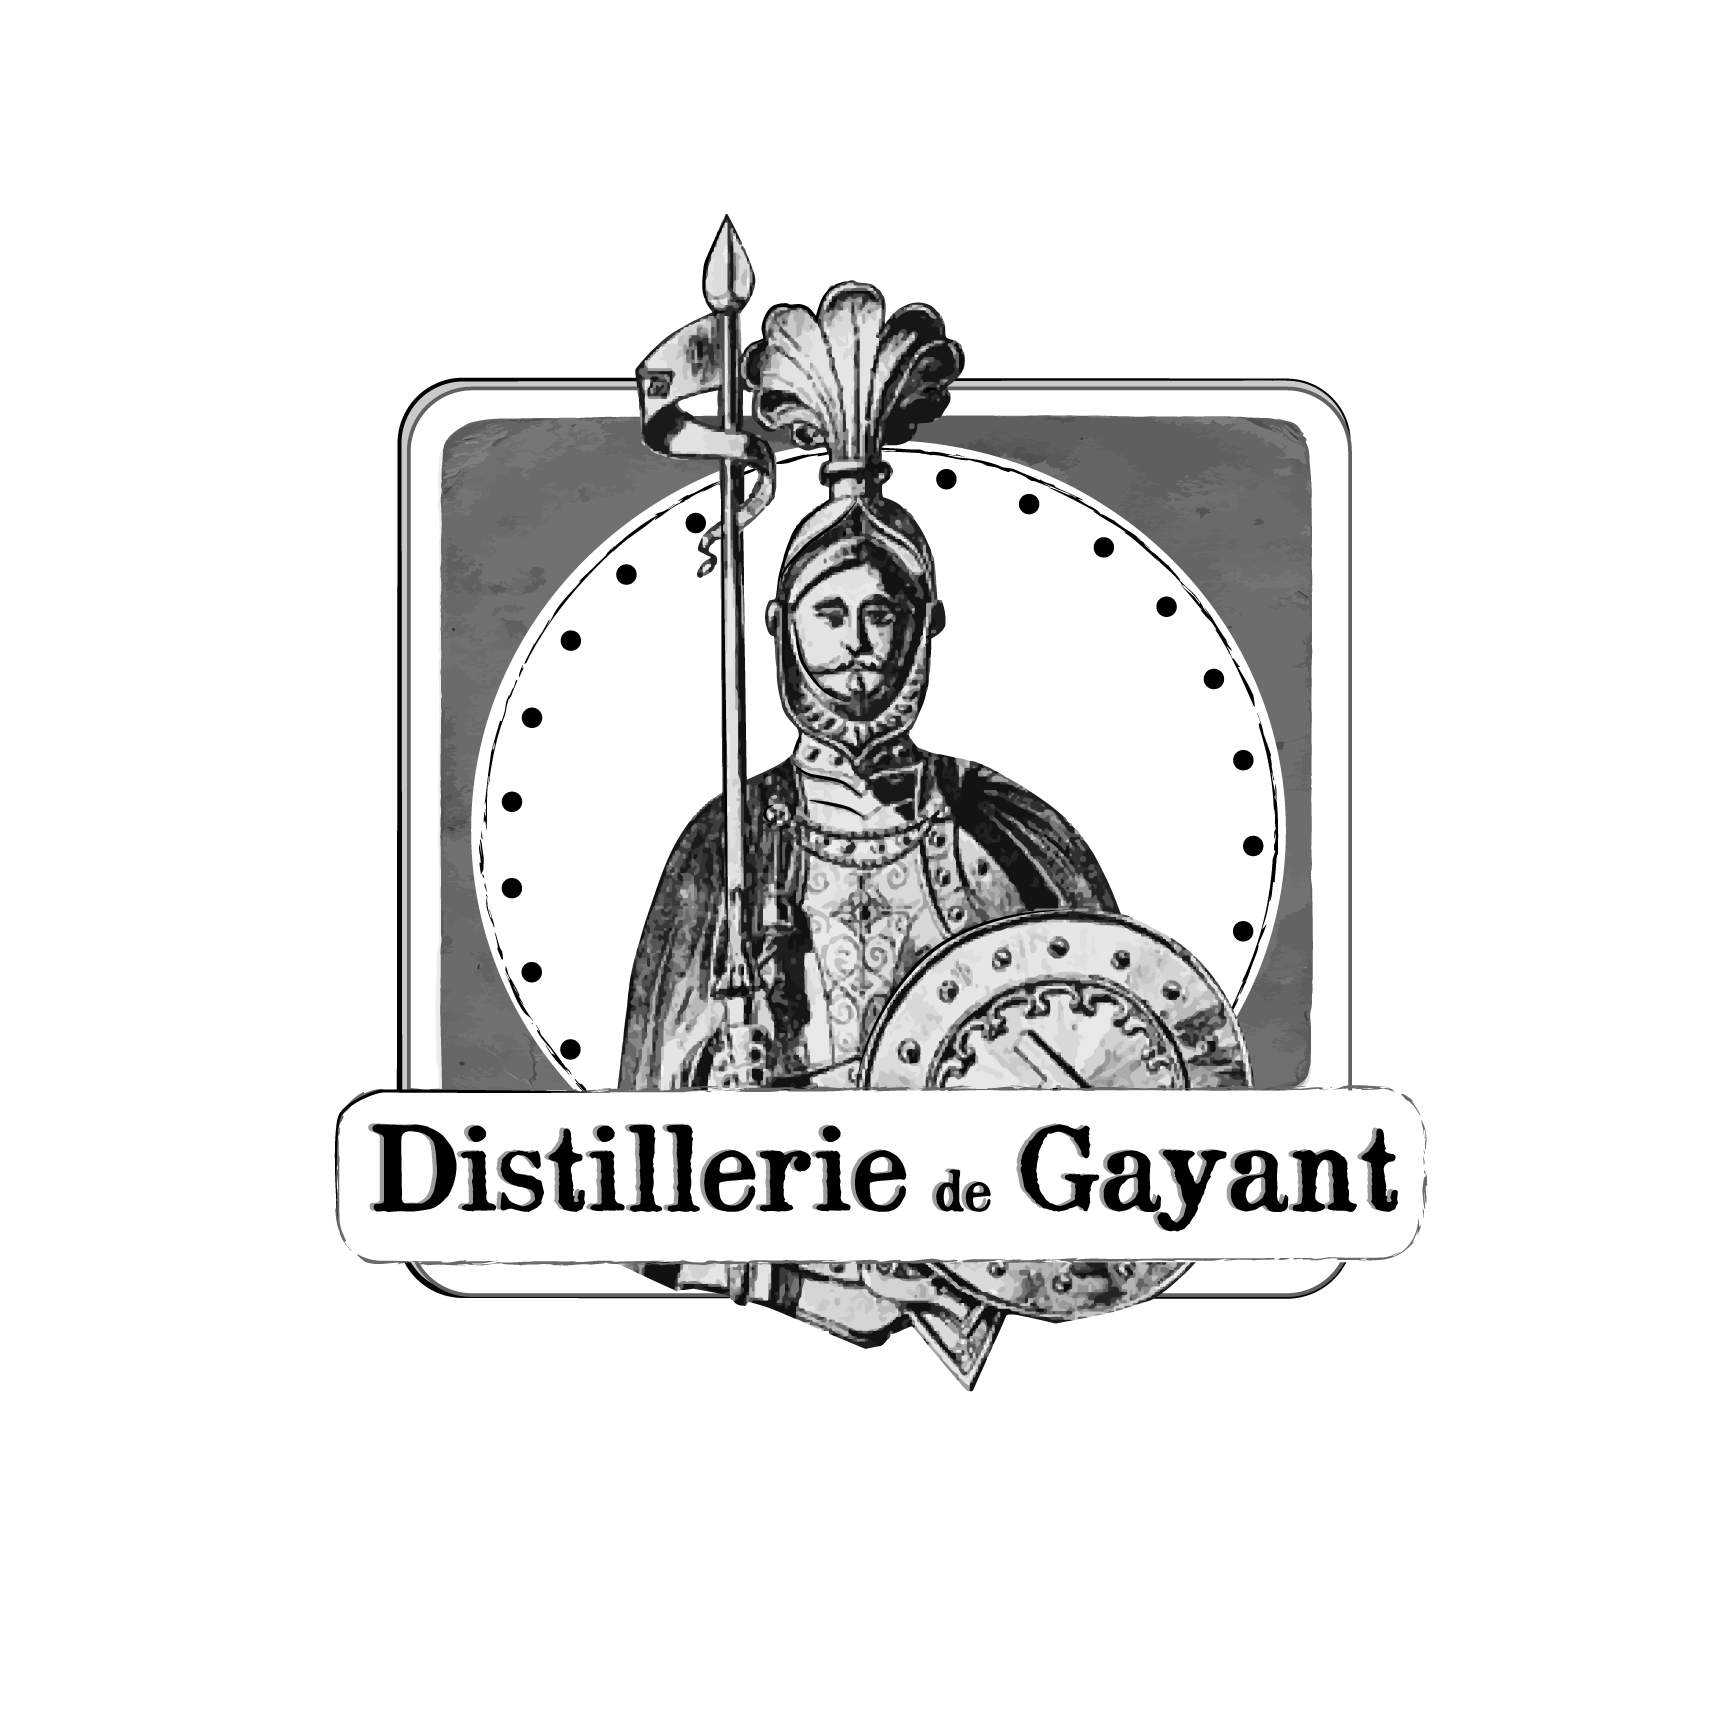 Distillerie de Gayant